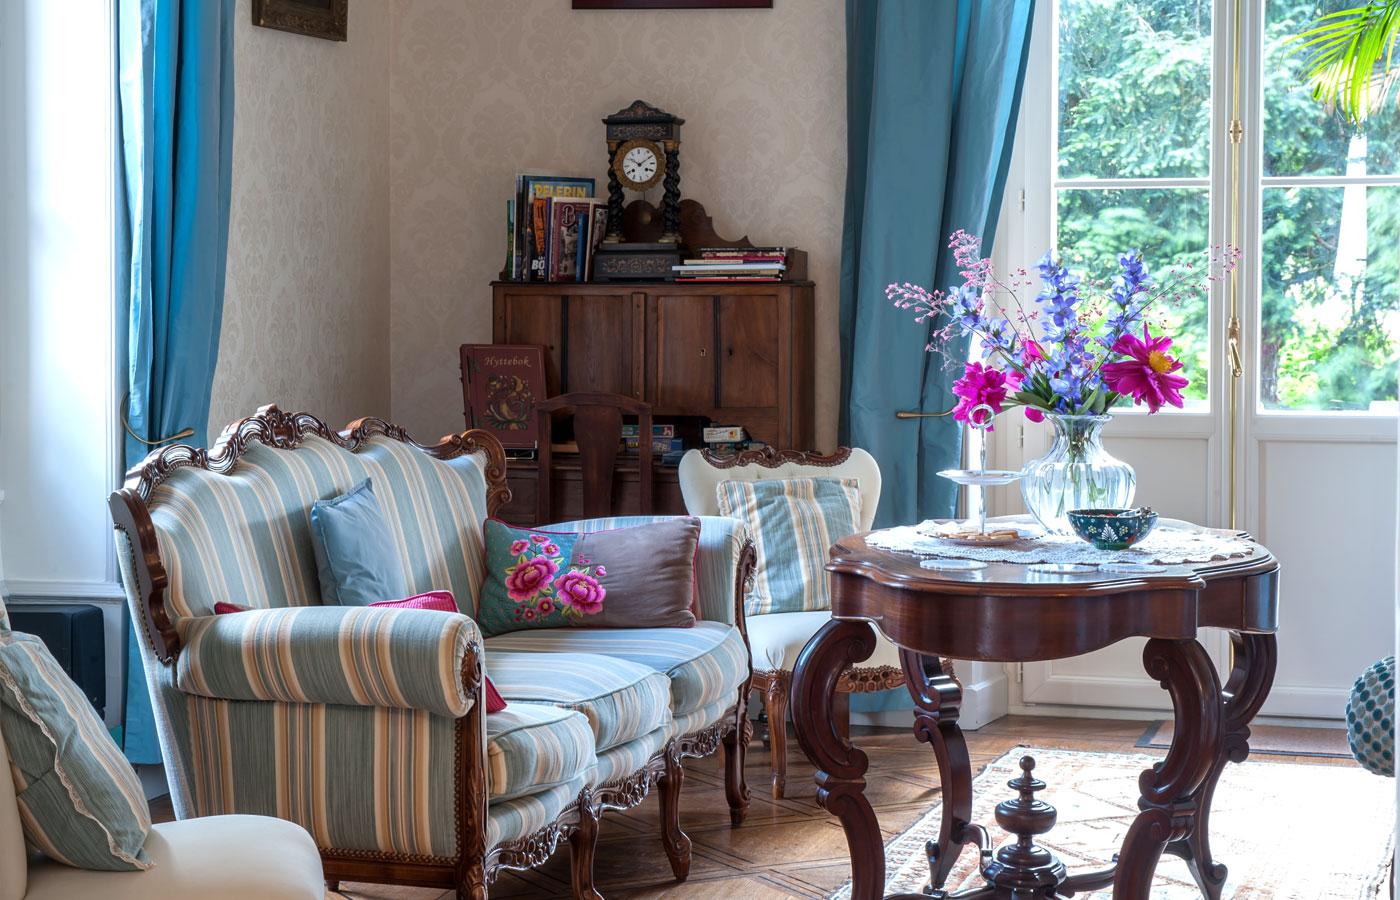 oustal en berry chambre d 39 h tes bourges. Black Bedroom Furniture Sets. Home Design Ideas